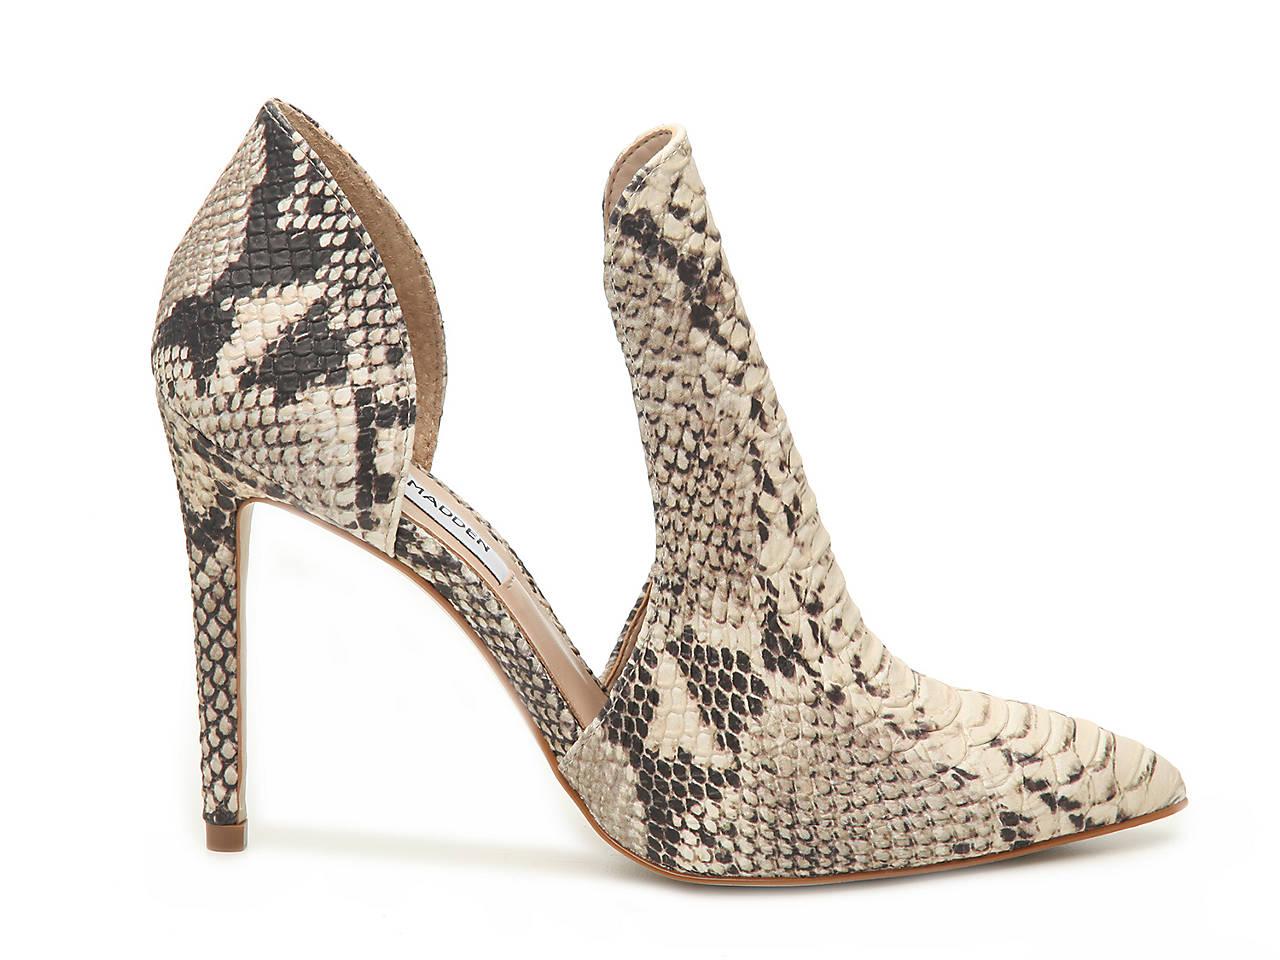 98e50696940 Steve Madden Dolly Pump Women s Shoes